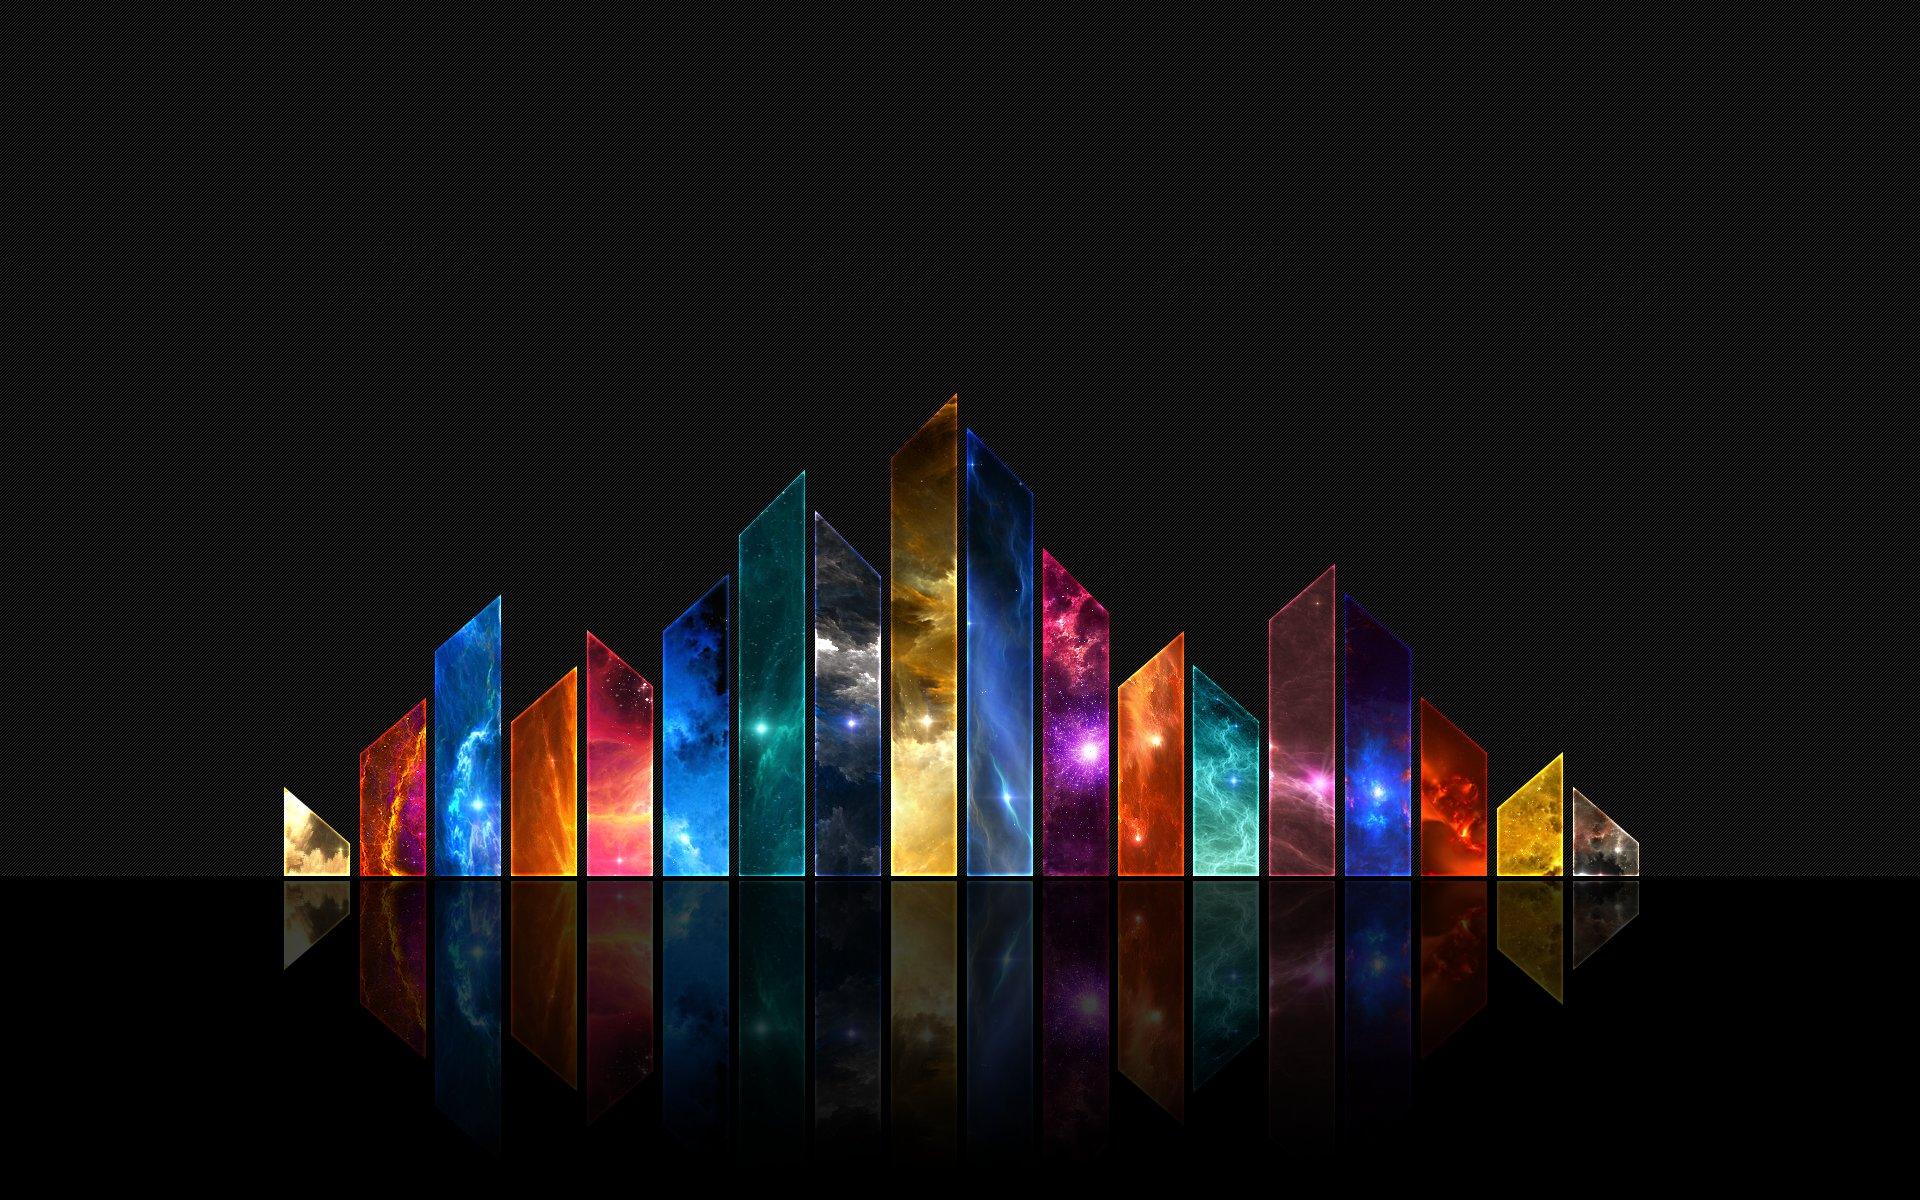 Crystal Pyramid Wallpaper Channel